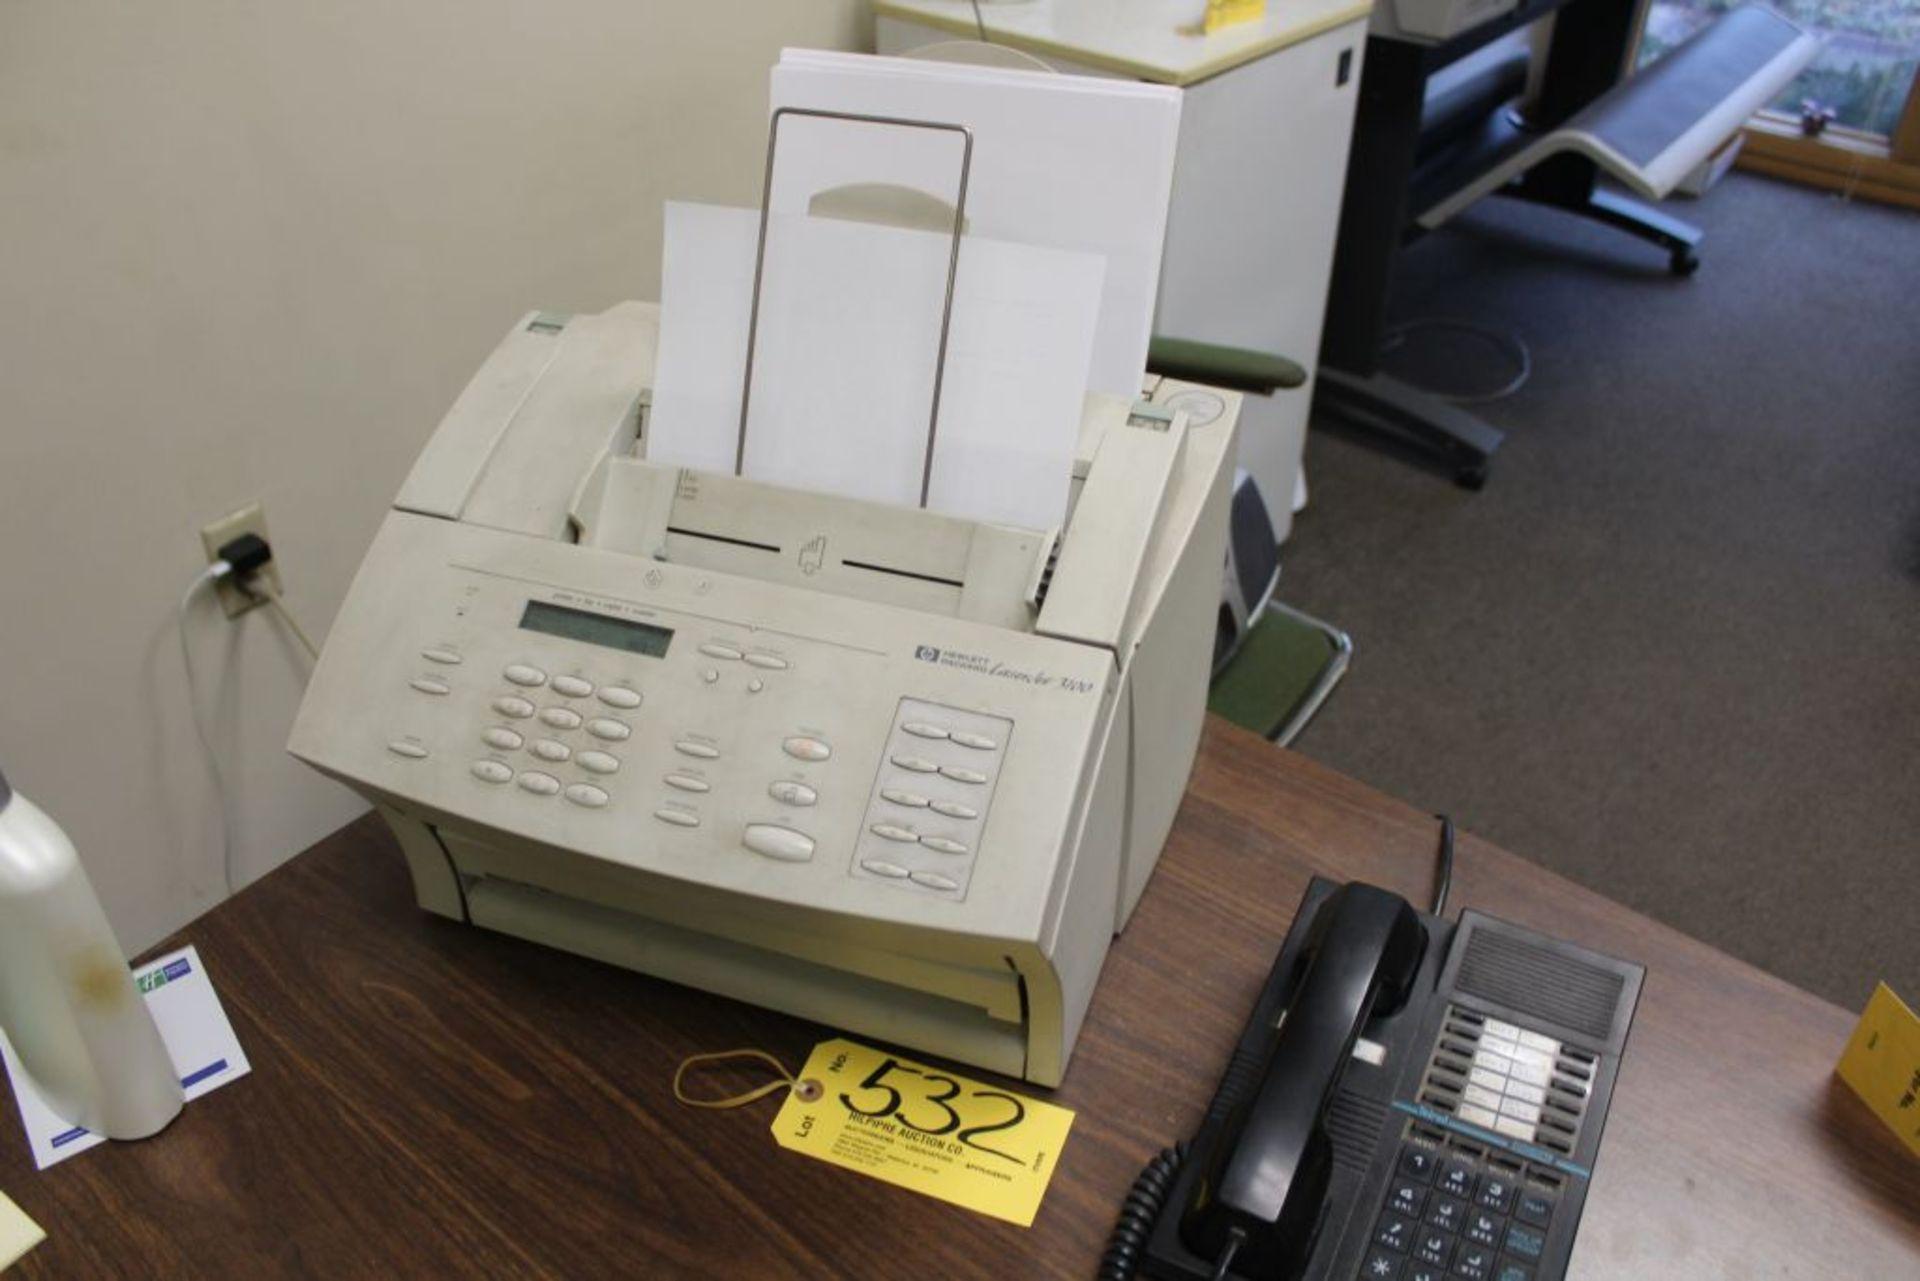 Lot 532 - H.P LaserJet 3100 printer.